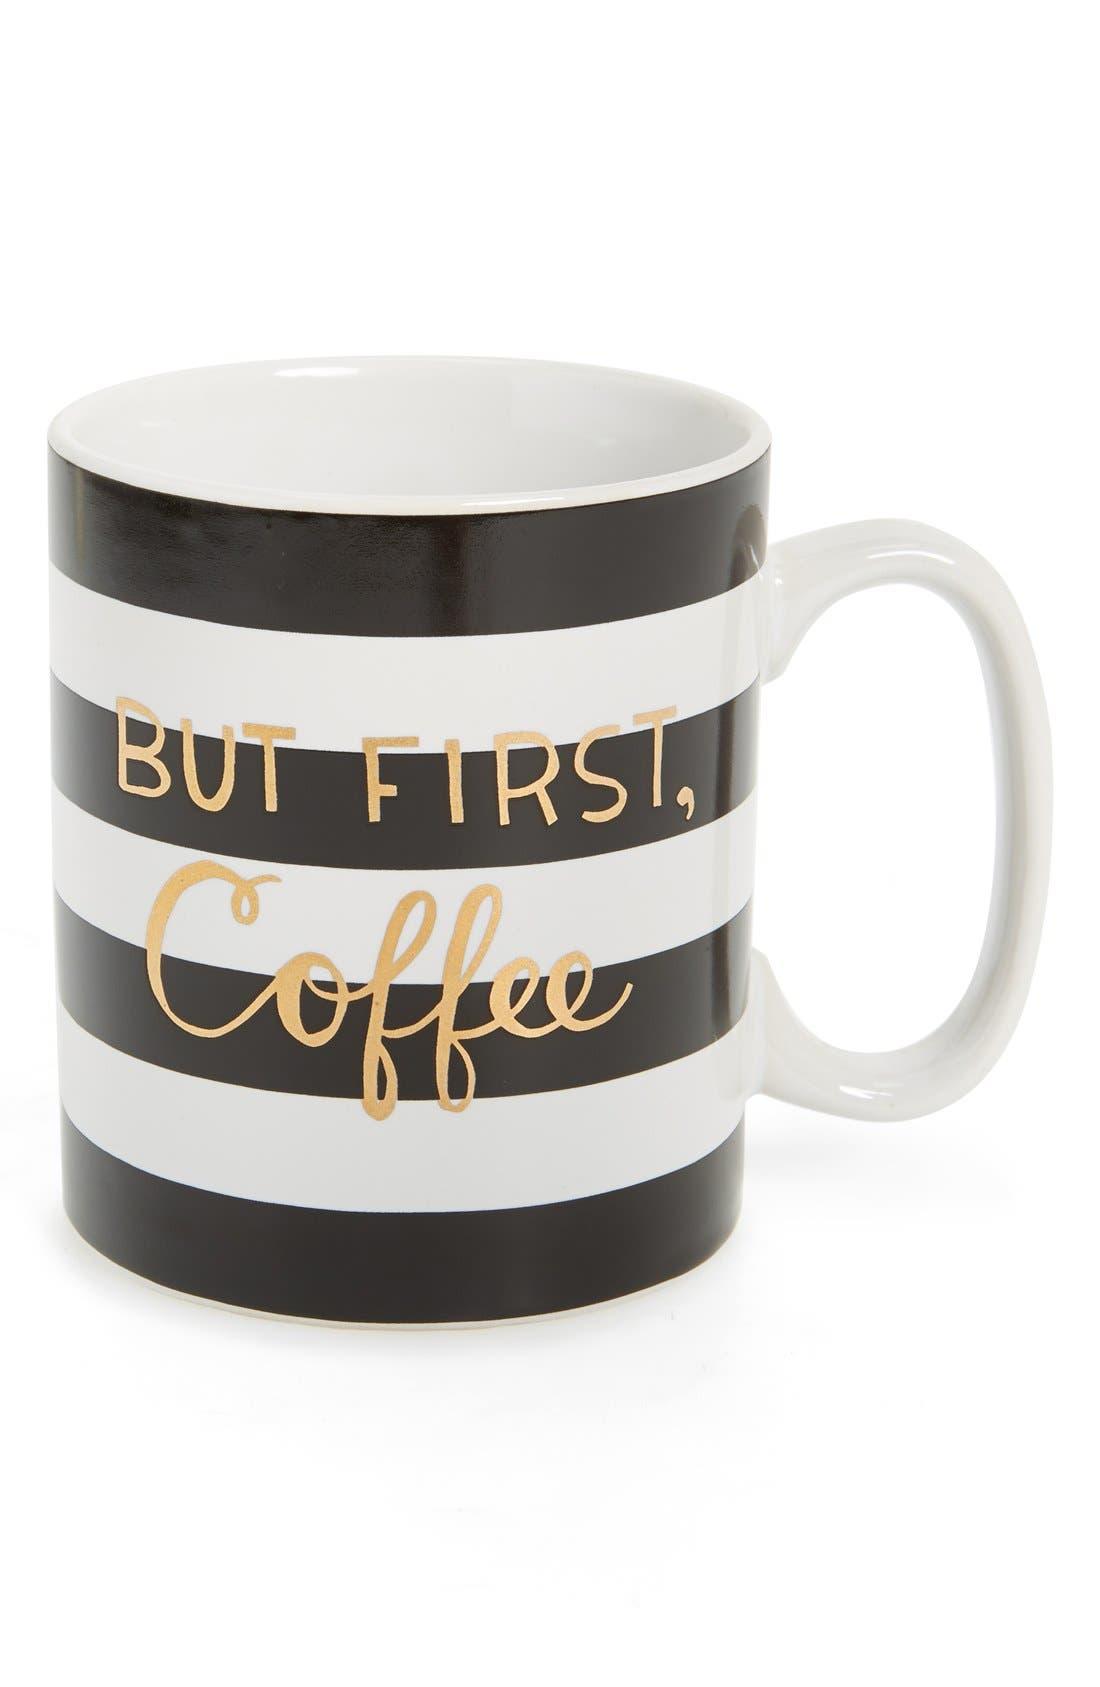 Main Image - Tri-Coastal Design 'But First, Coffee' Ceramic Mug